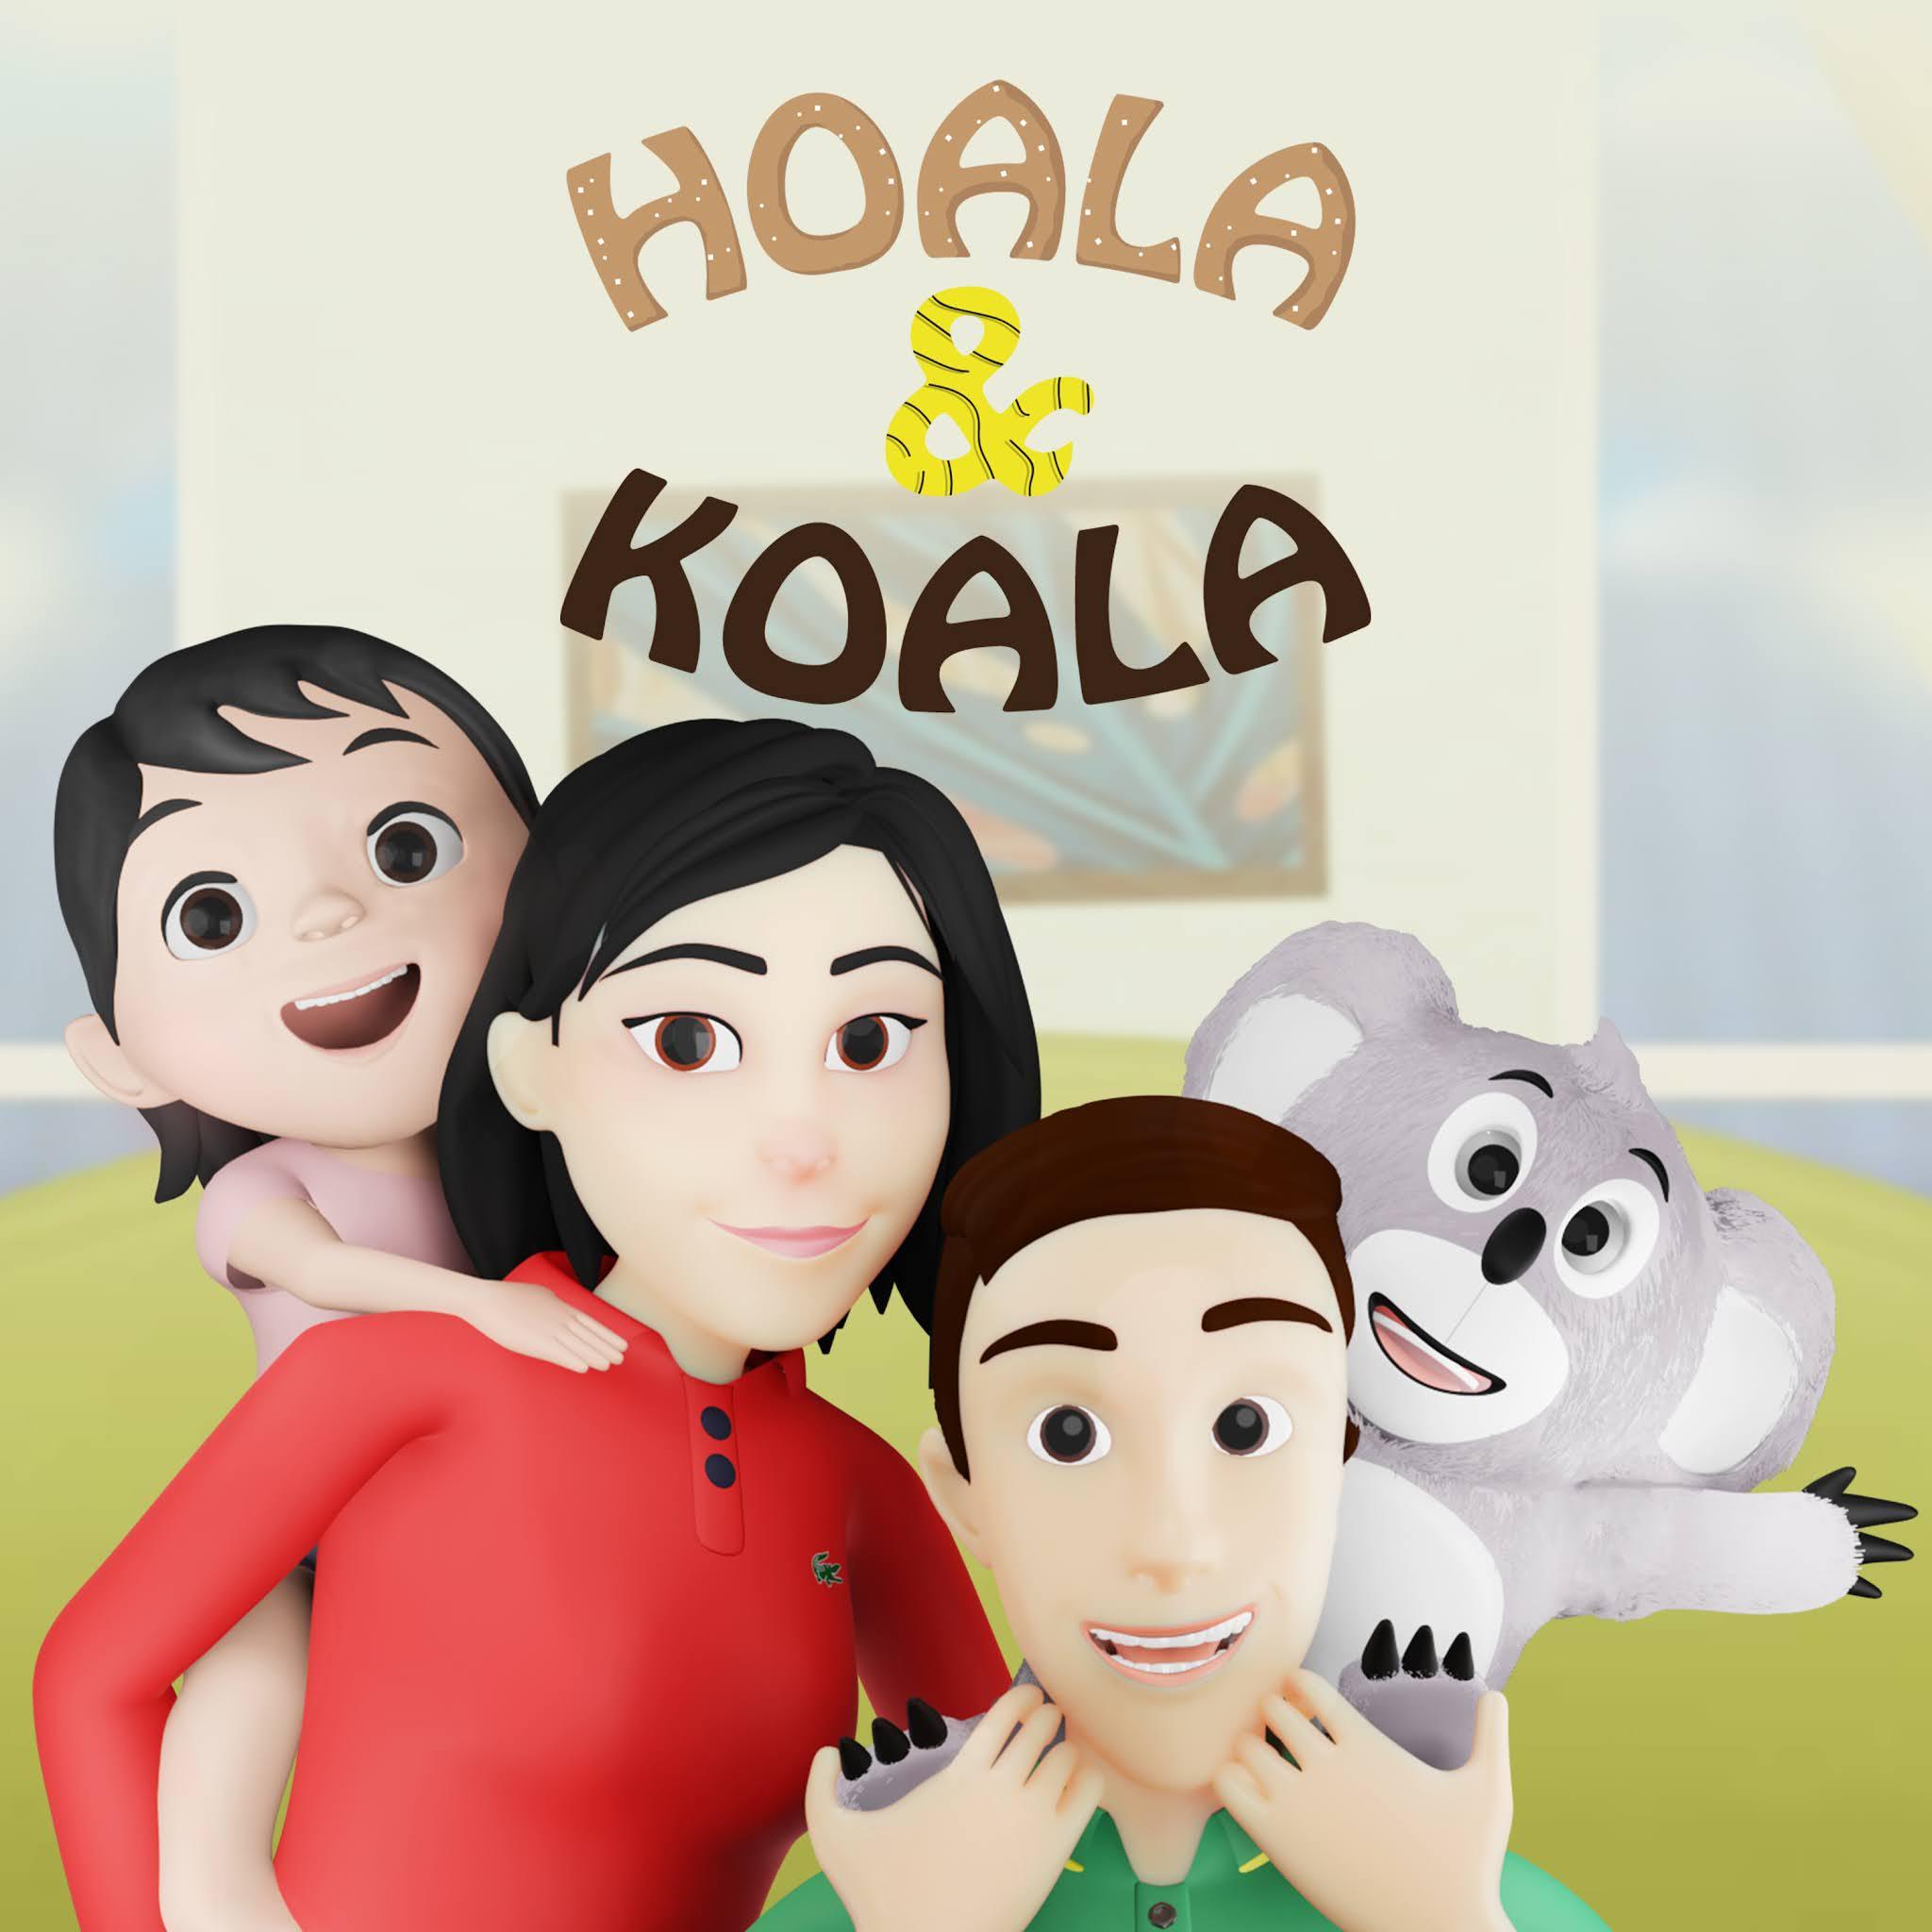 Bingung Mencari Lagu Anak Indonesia? Di Youtube Hoala & Koala Saja